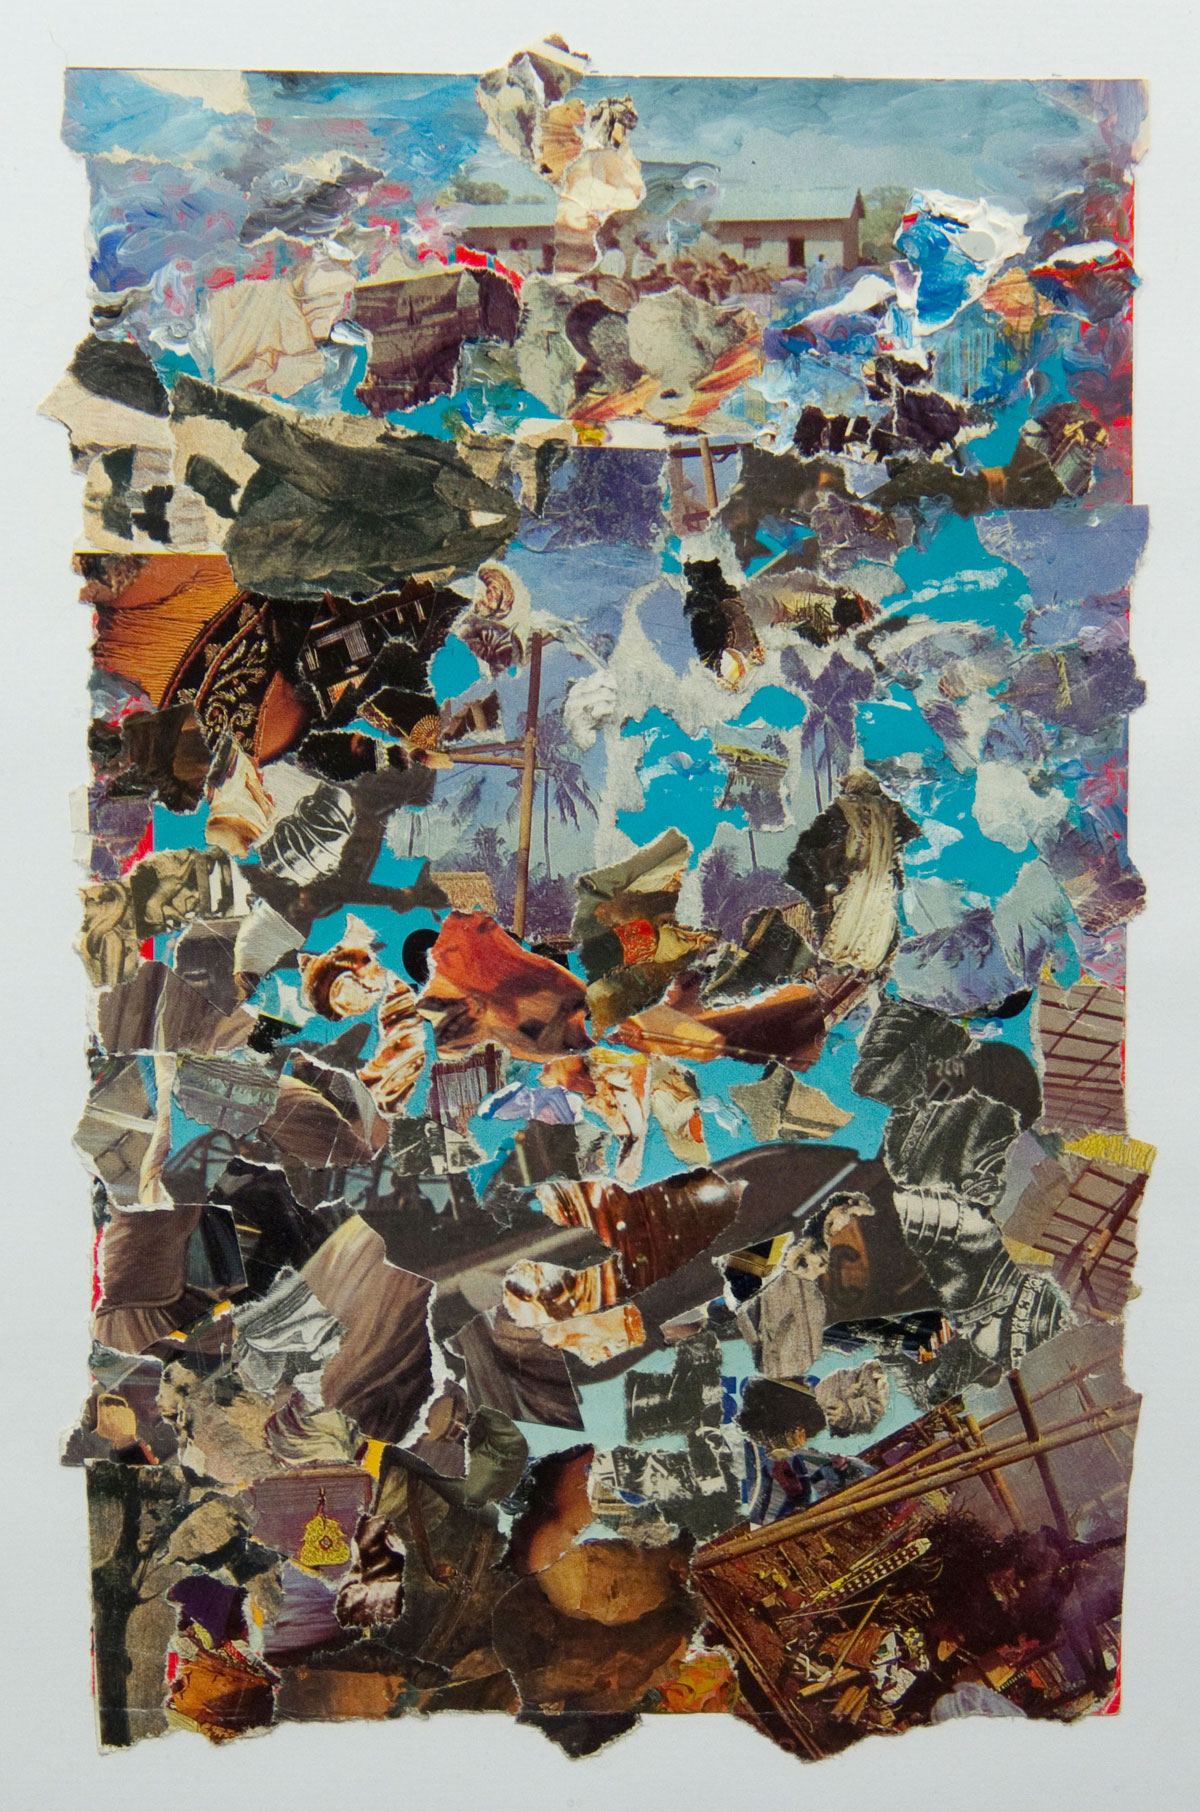 Philippe Briard - Vogue la galère, 2008, collage acrilique, 25 x 15,5 cm